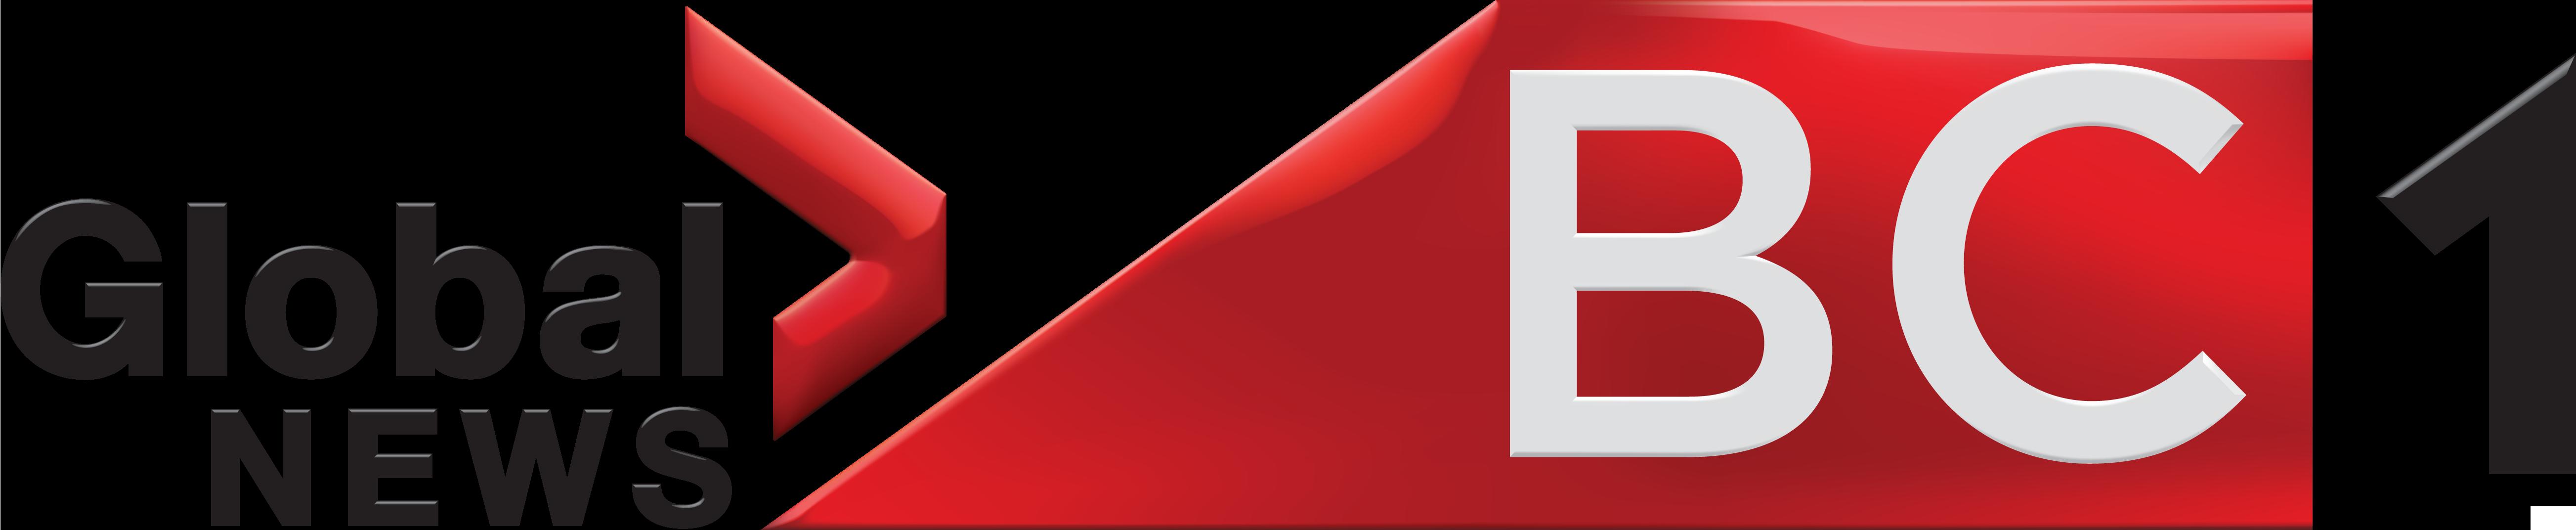 Global BC1 - 24 Hour News - Optik TV Channels   TELUS   TELUS